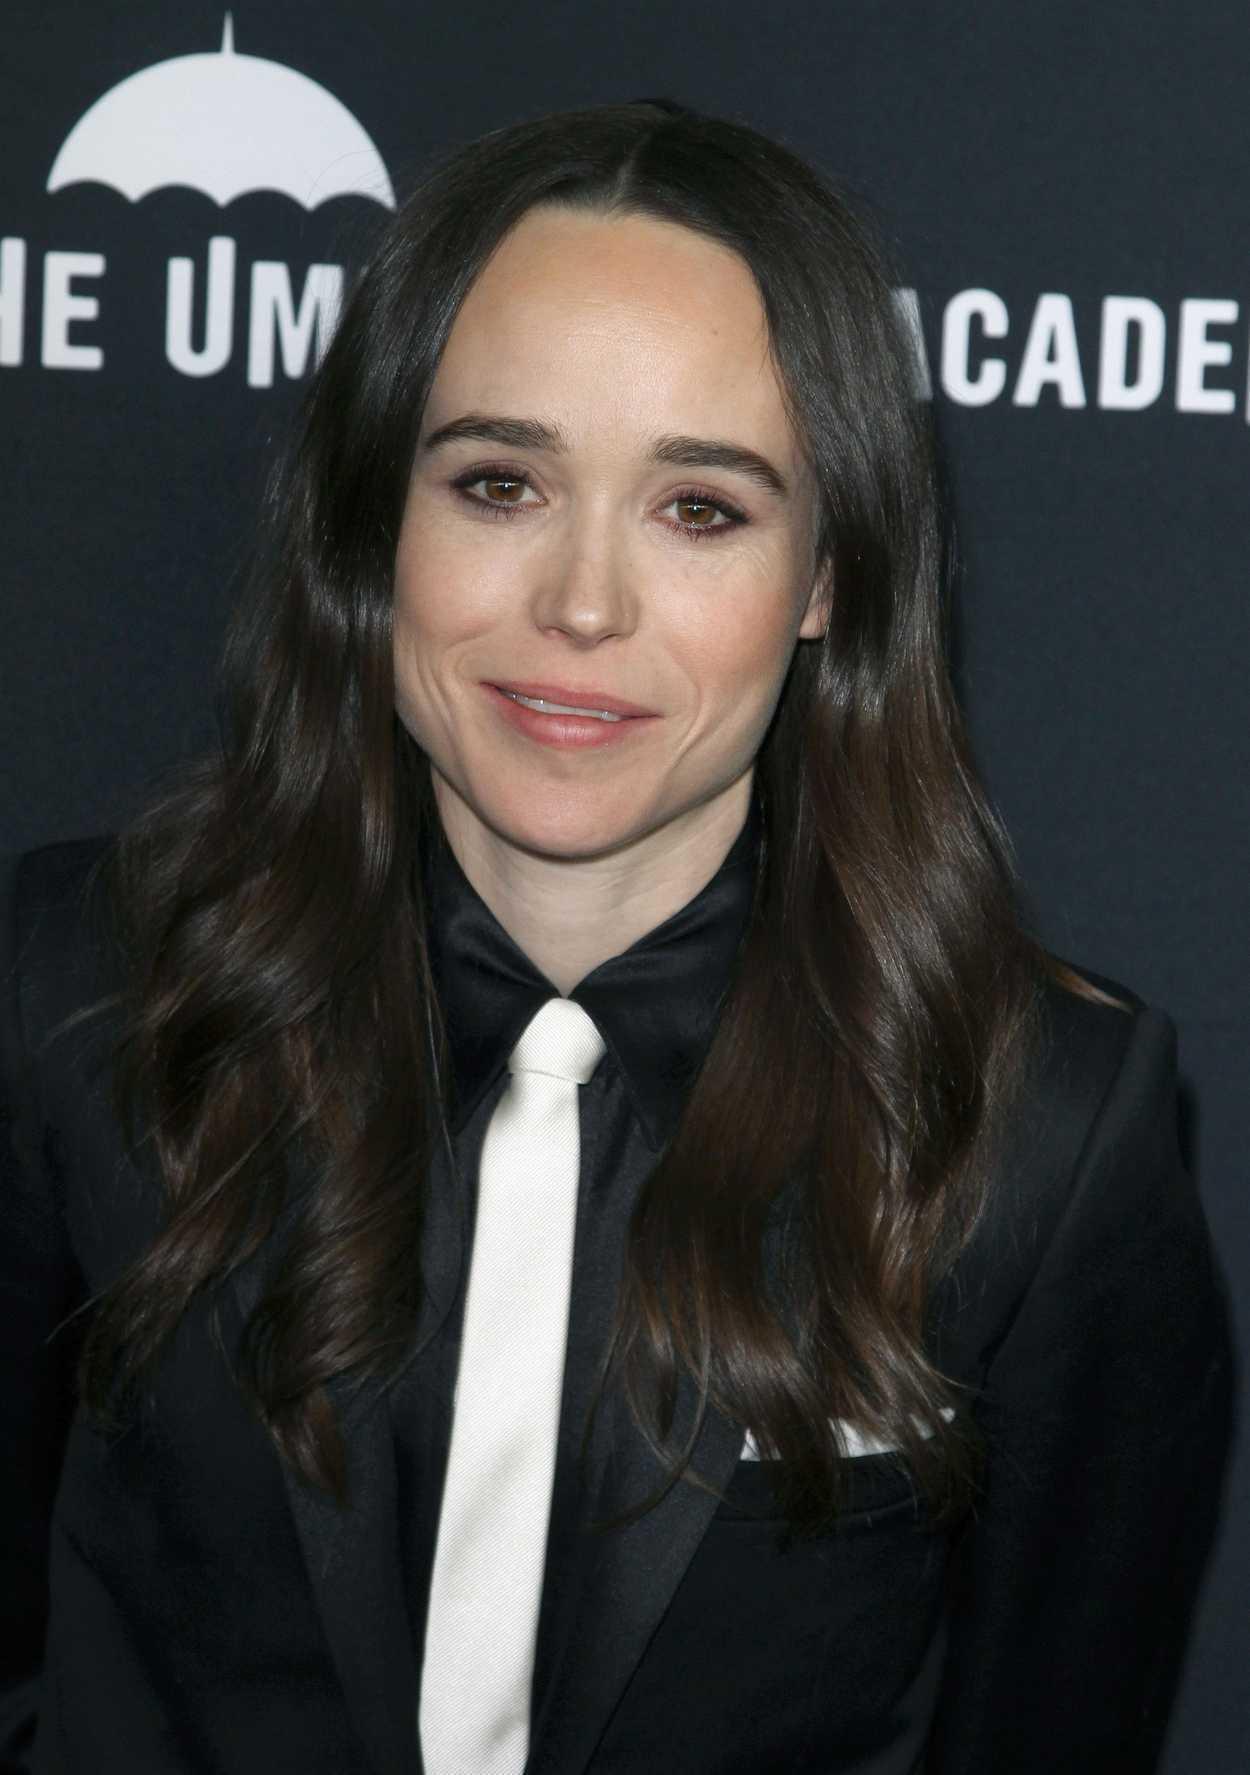 Ellen Page Attends The Umbrella Academy Tv Show Premiere